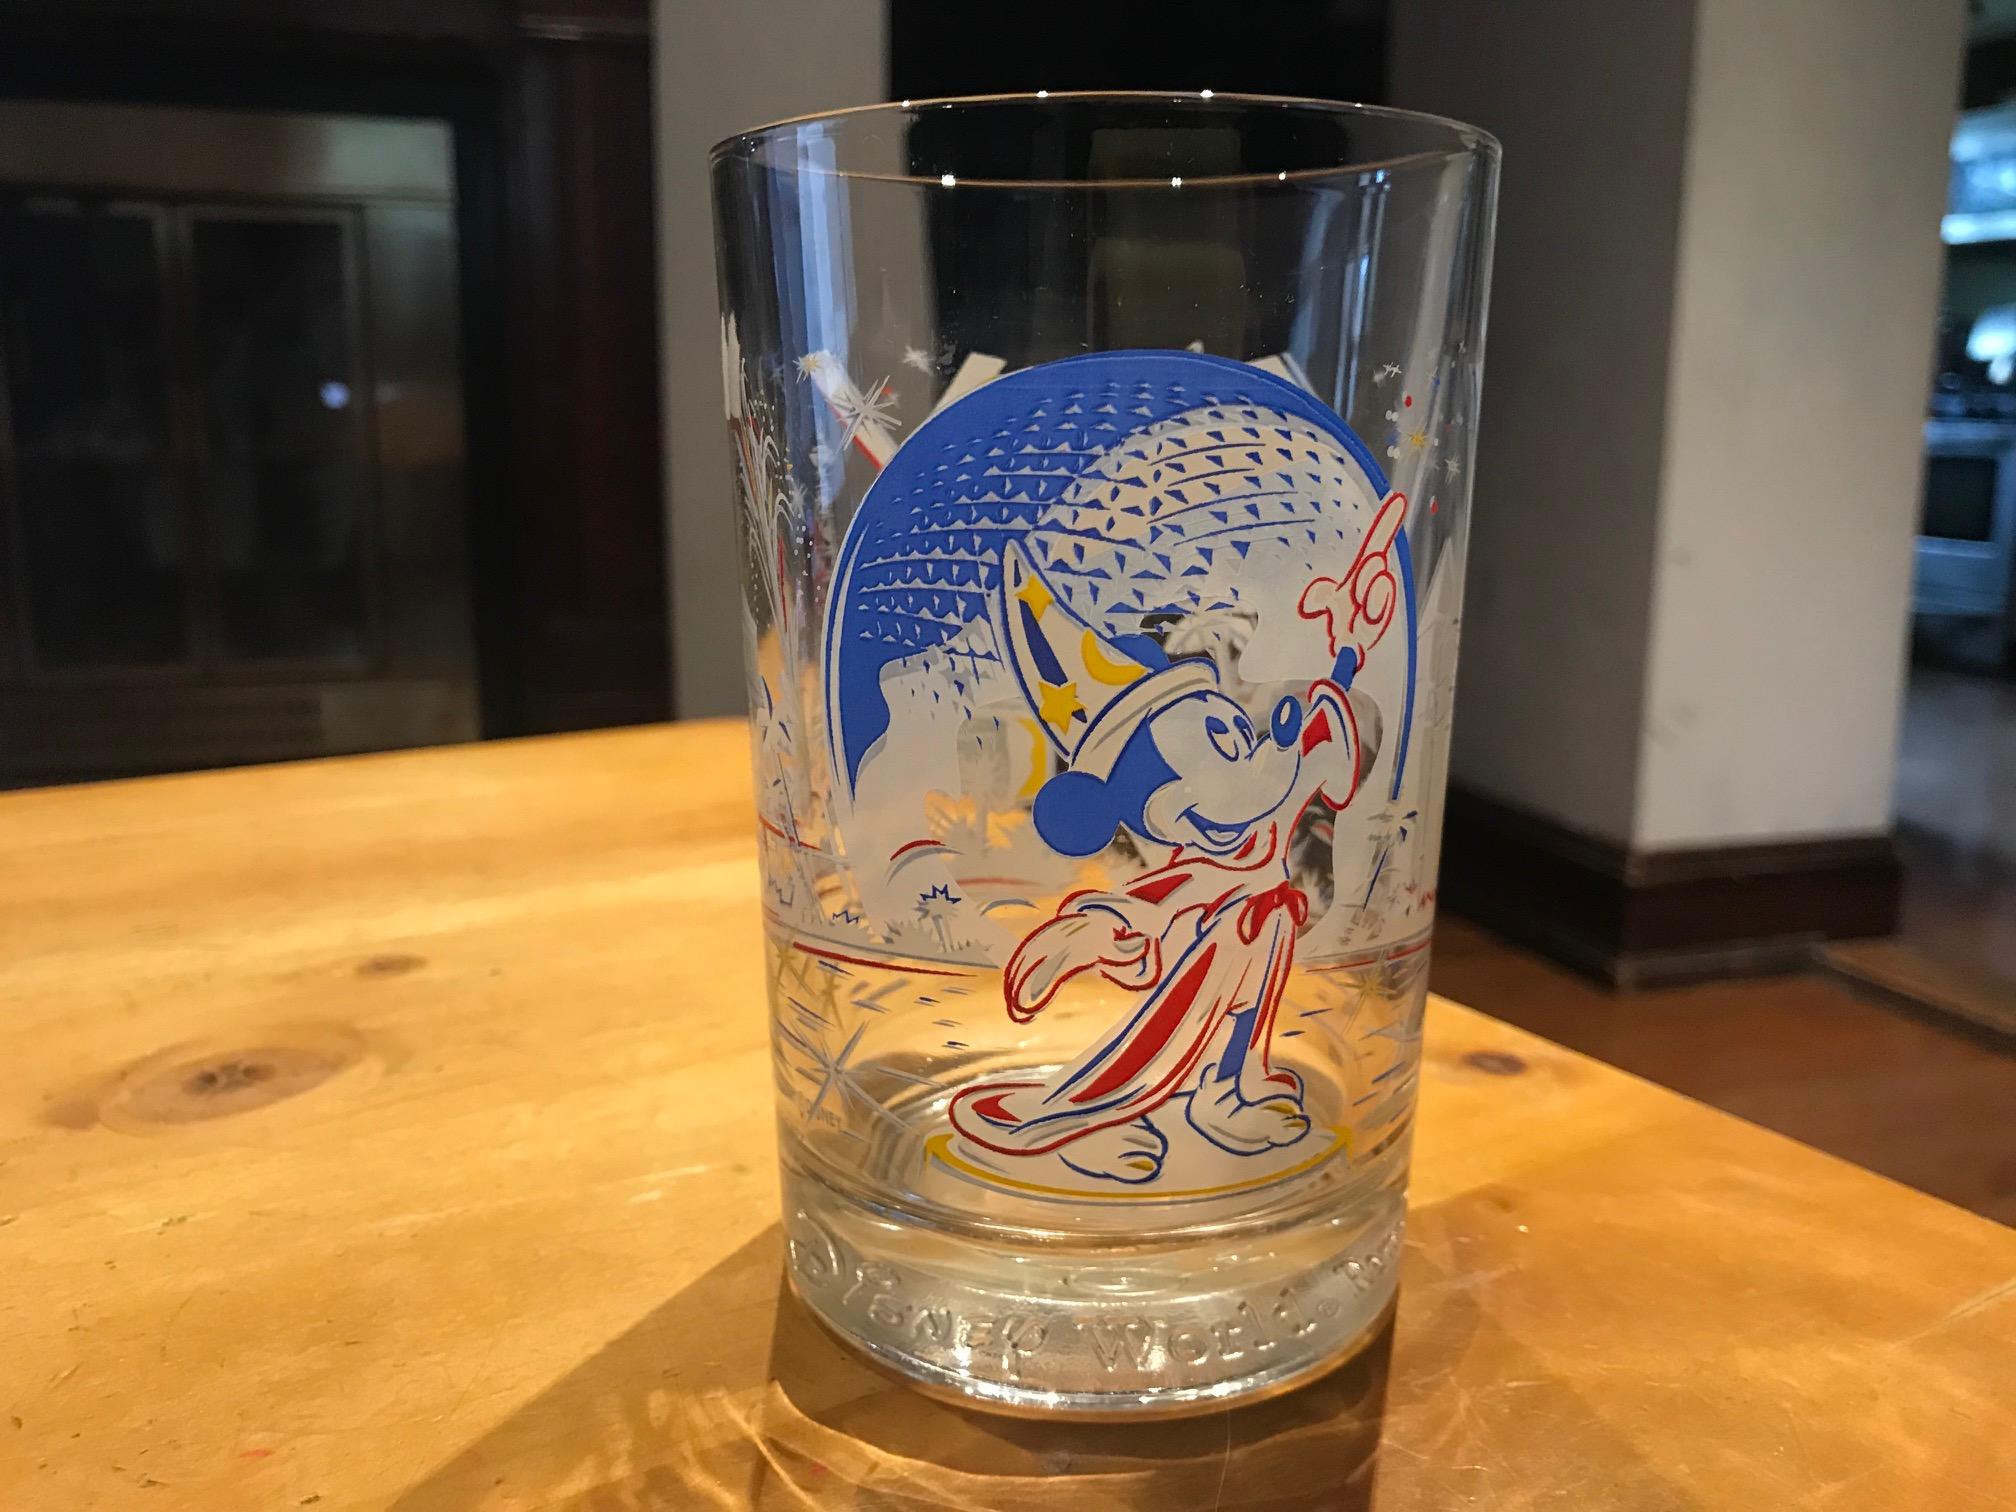 c. 1996 Mickey Mouse Disney World McDonald's 25th Anniversary Drinking Glass: 73,300 ppm Lead + 1,855 ppm Cadmium